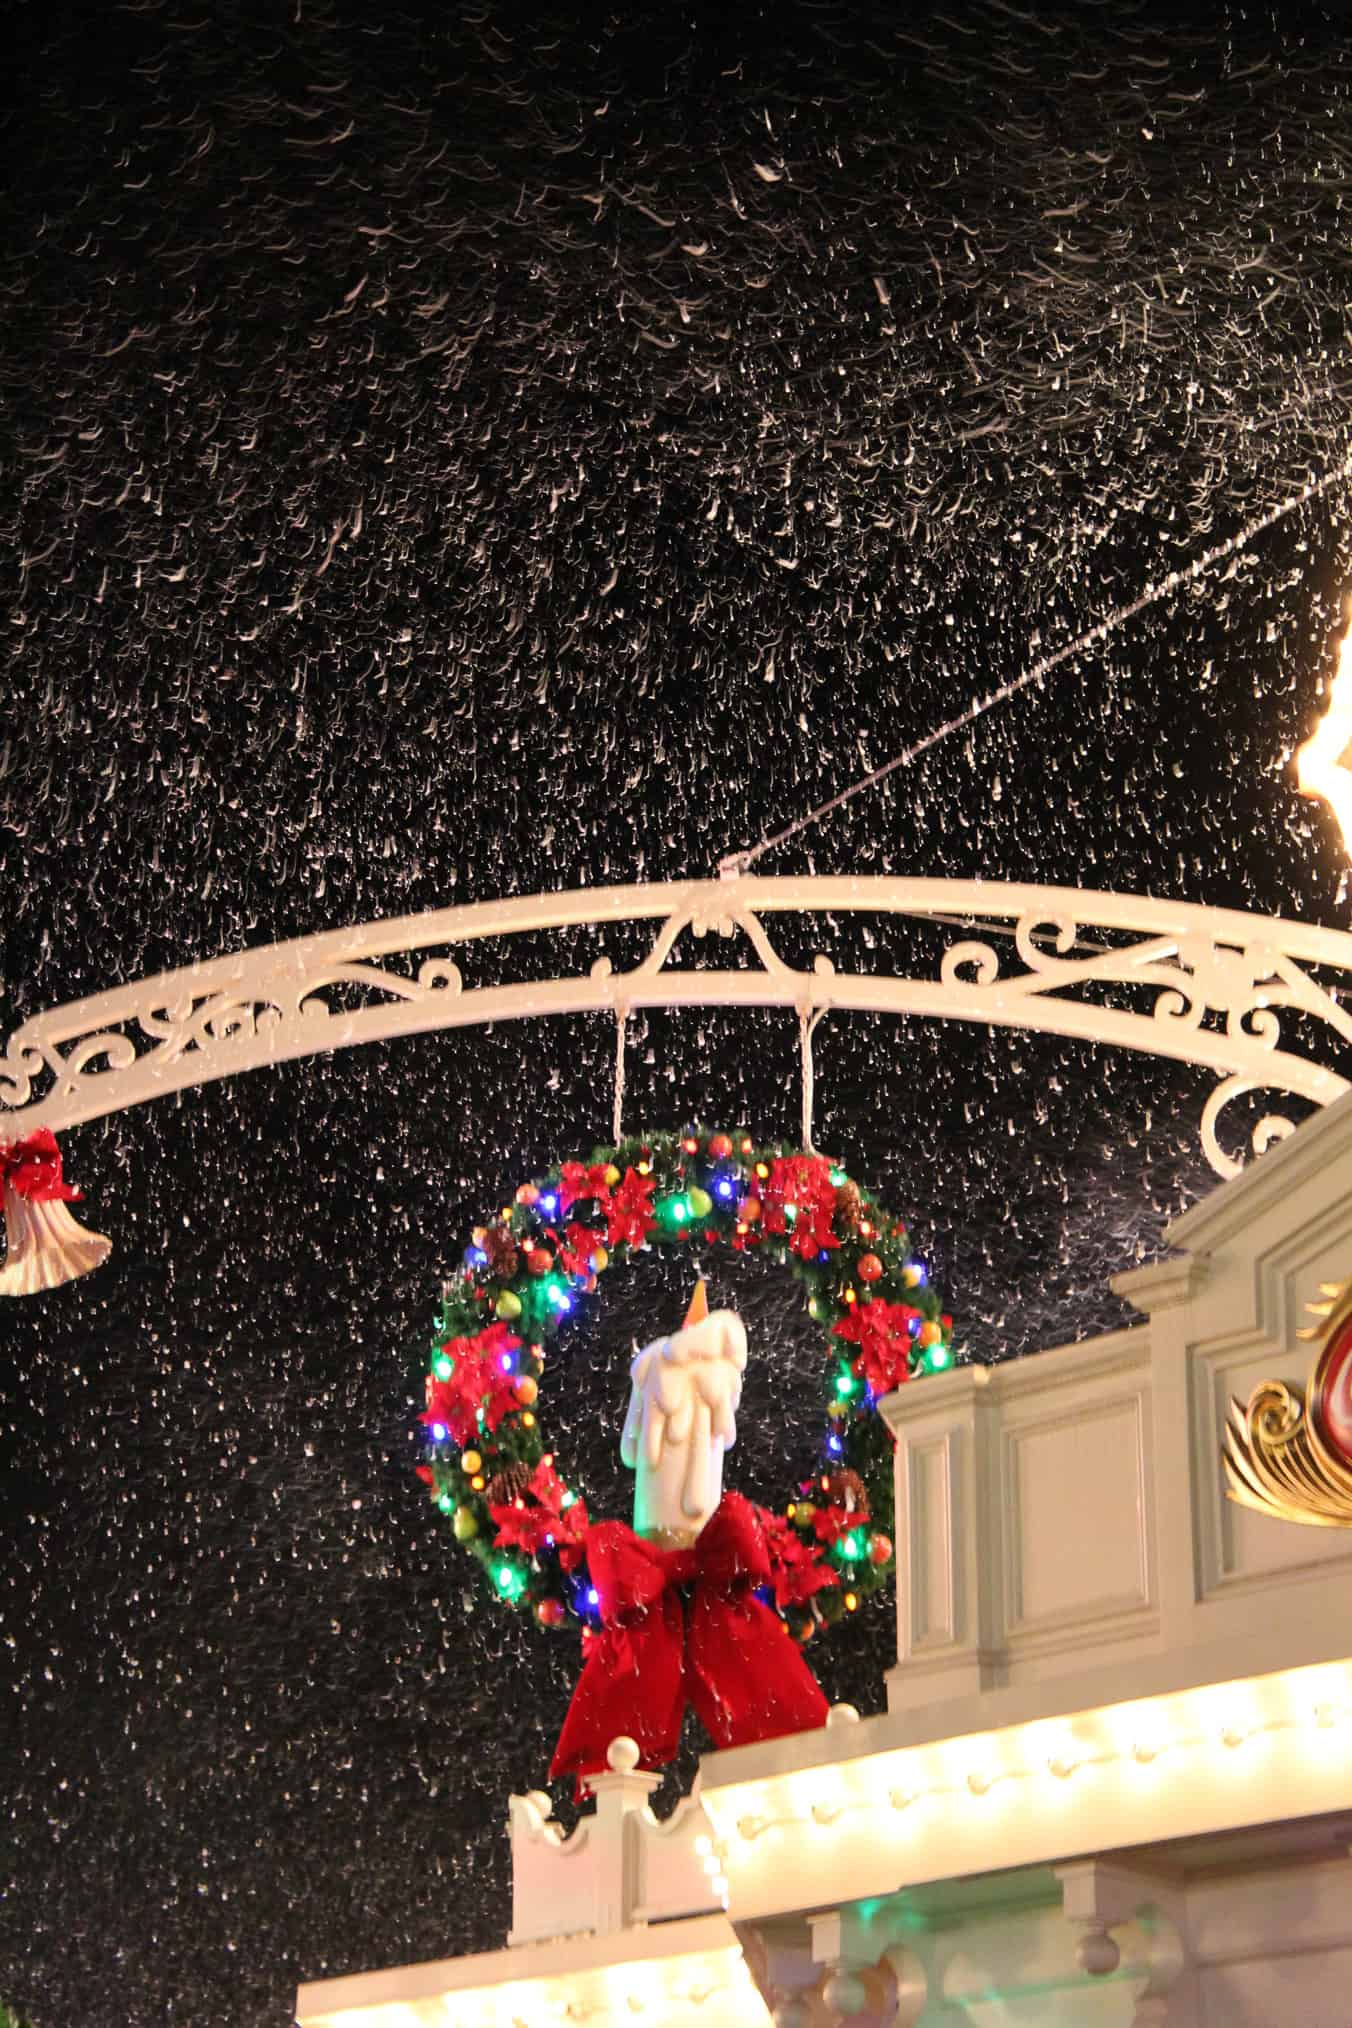 Walt Disney World During the Holiday Season